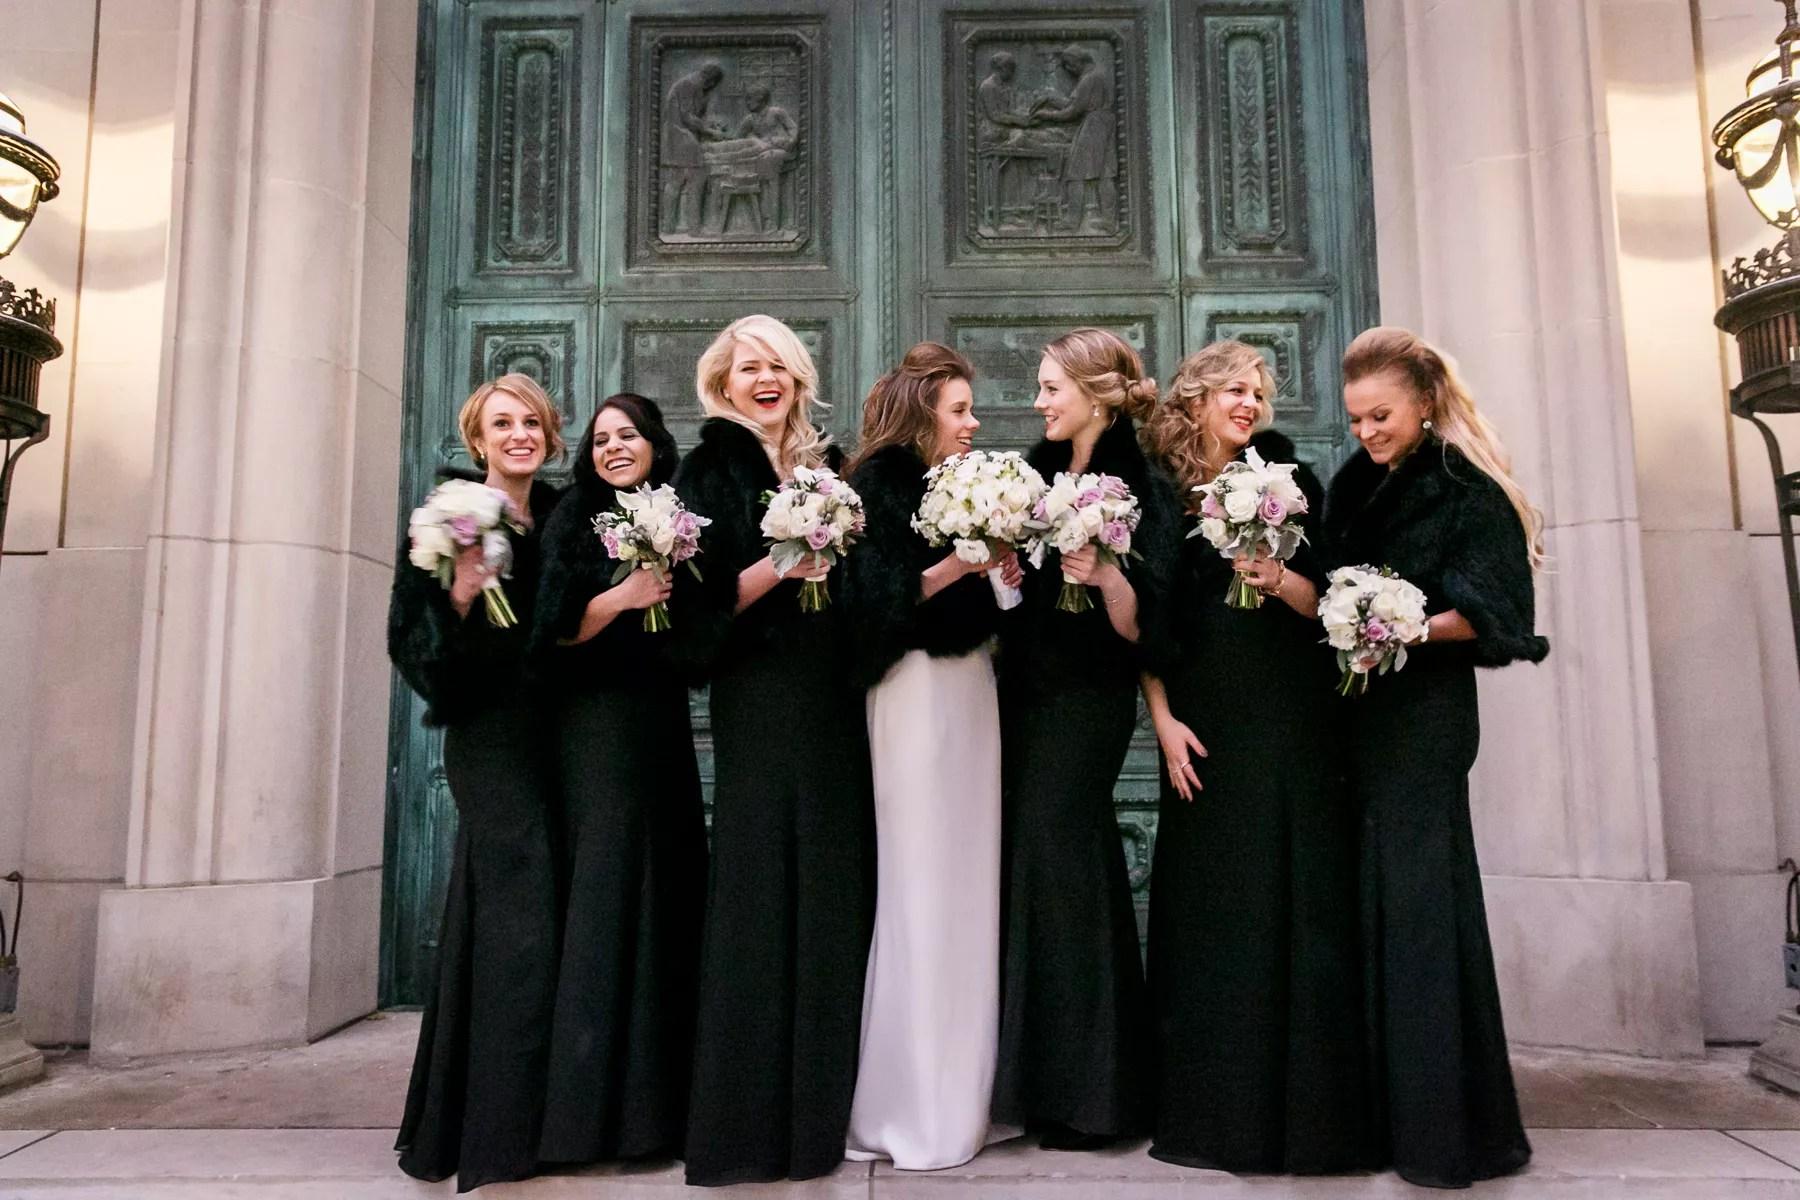 Black Bridesmaid Dresses With Fur Wraps